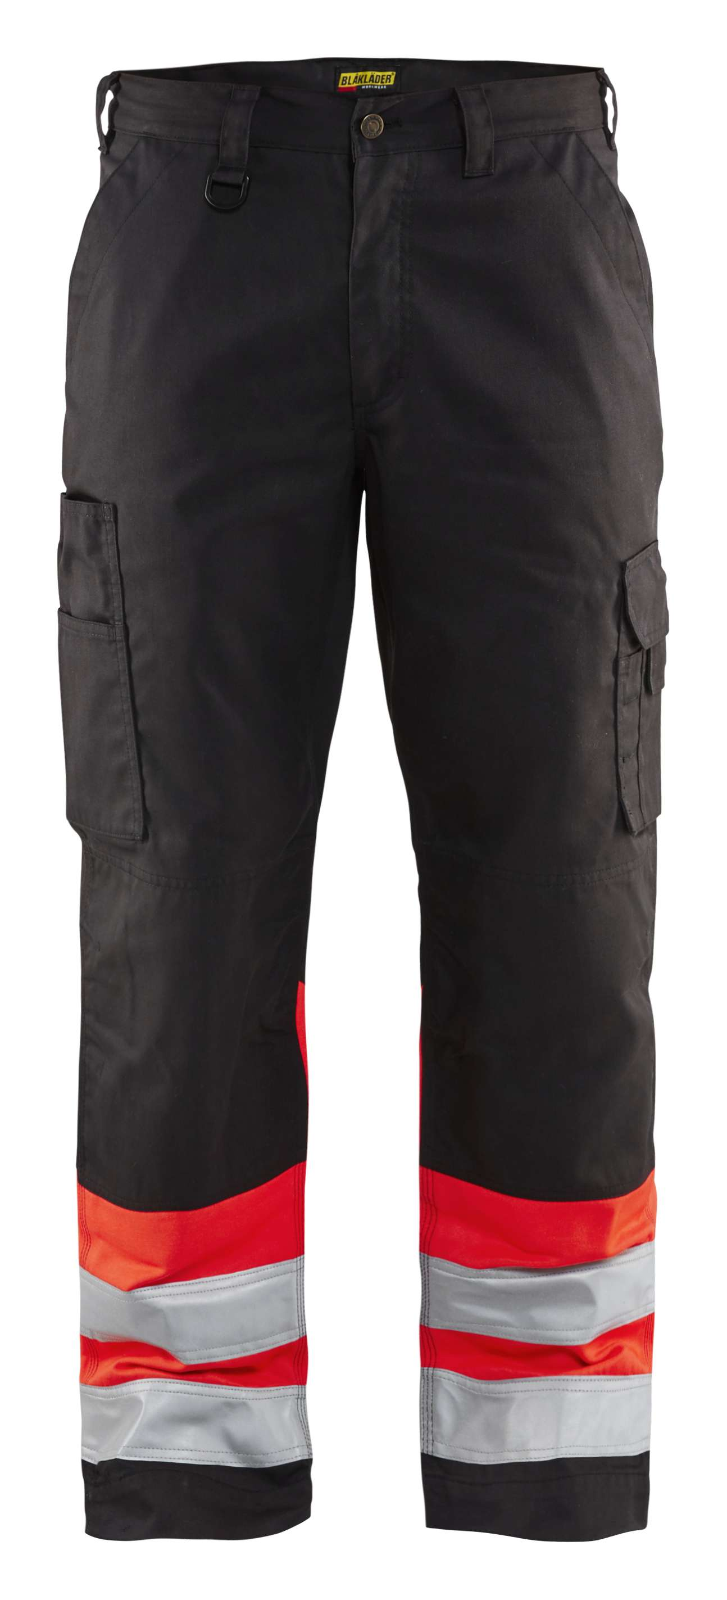 Blaklader Werkbroeken 15641811 High Vis zwart-fluor rood(9955)